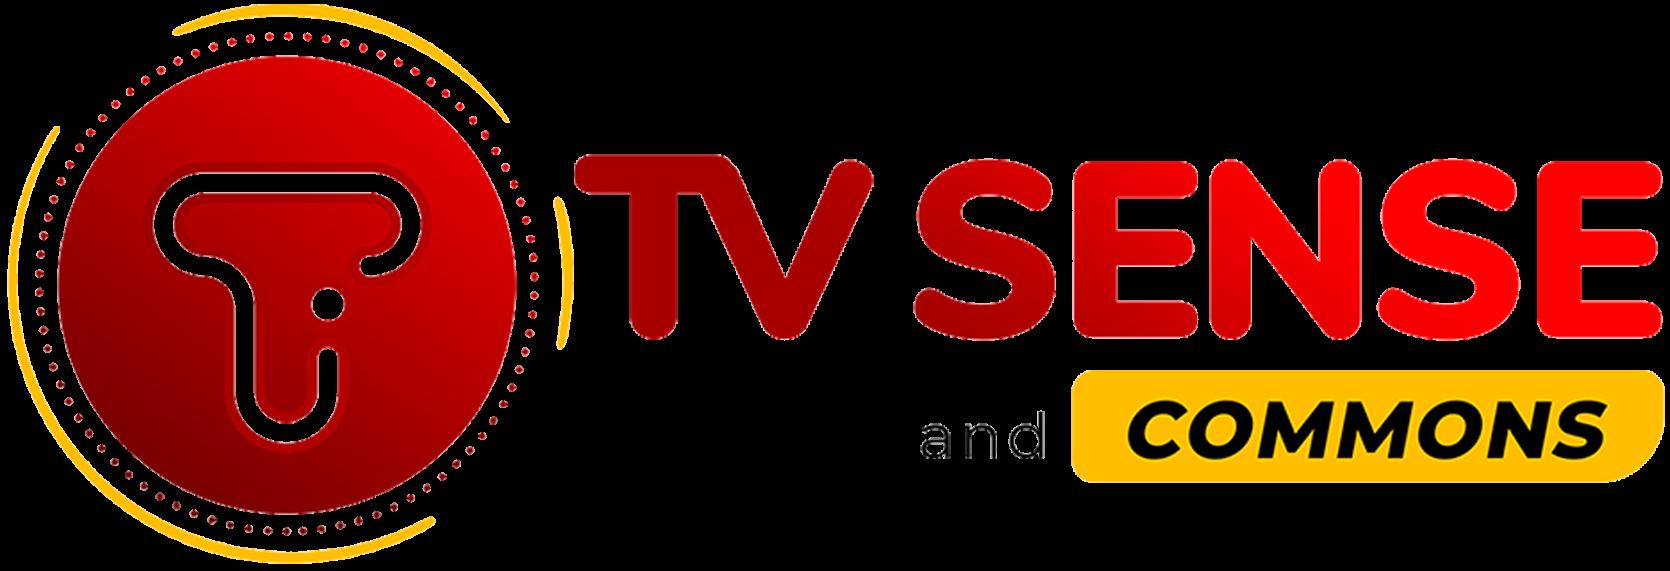 TV SENSE